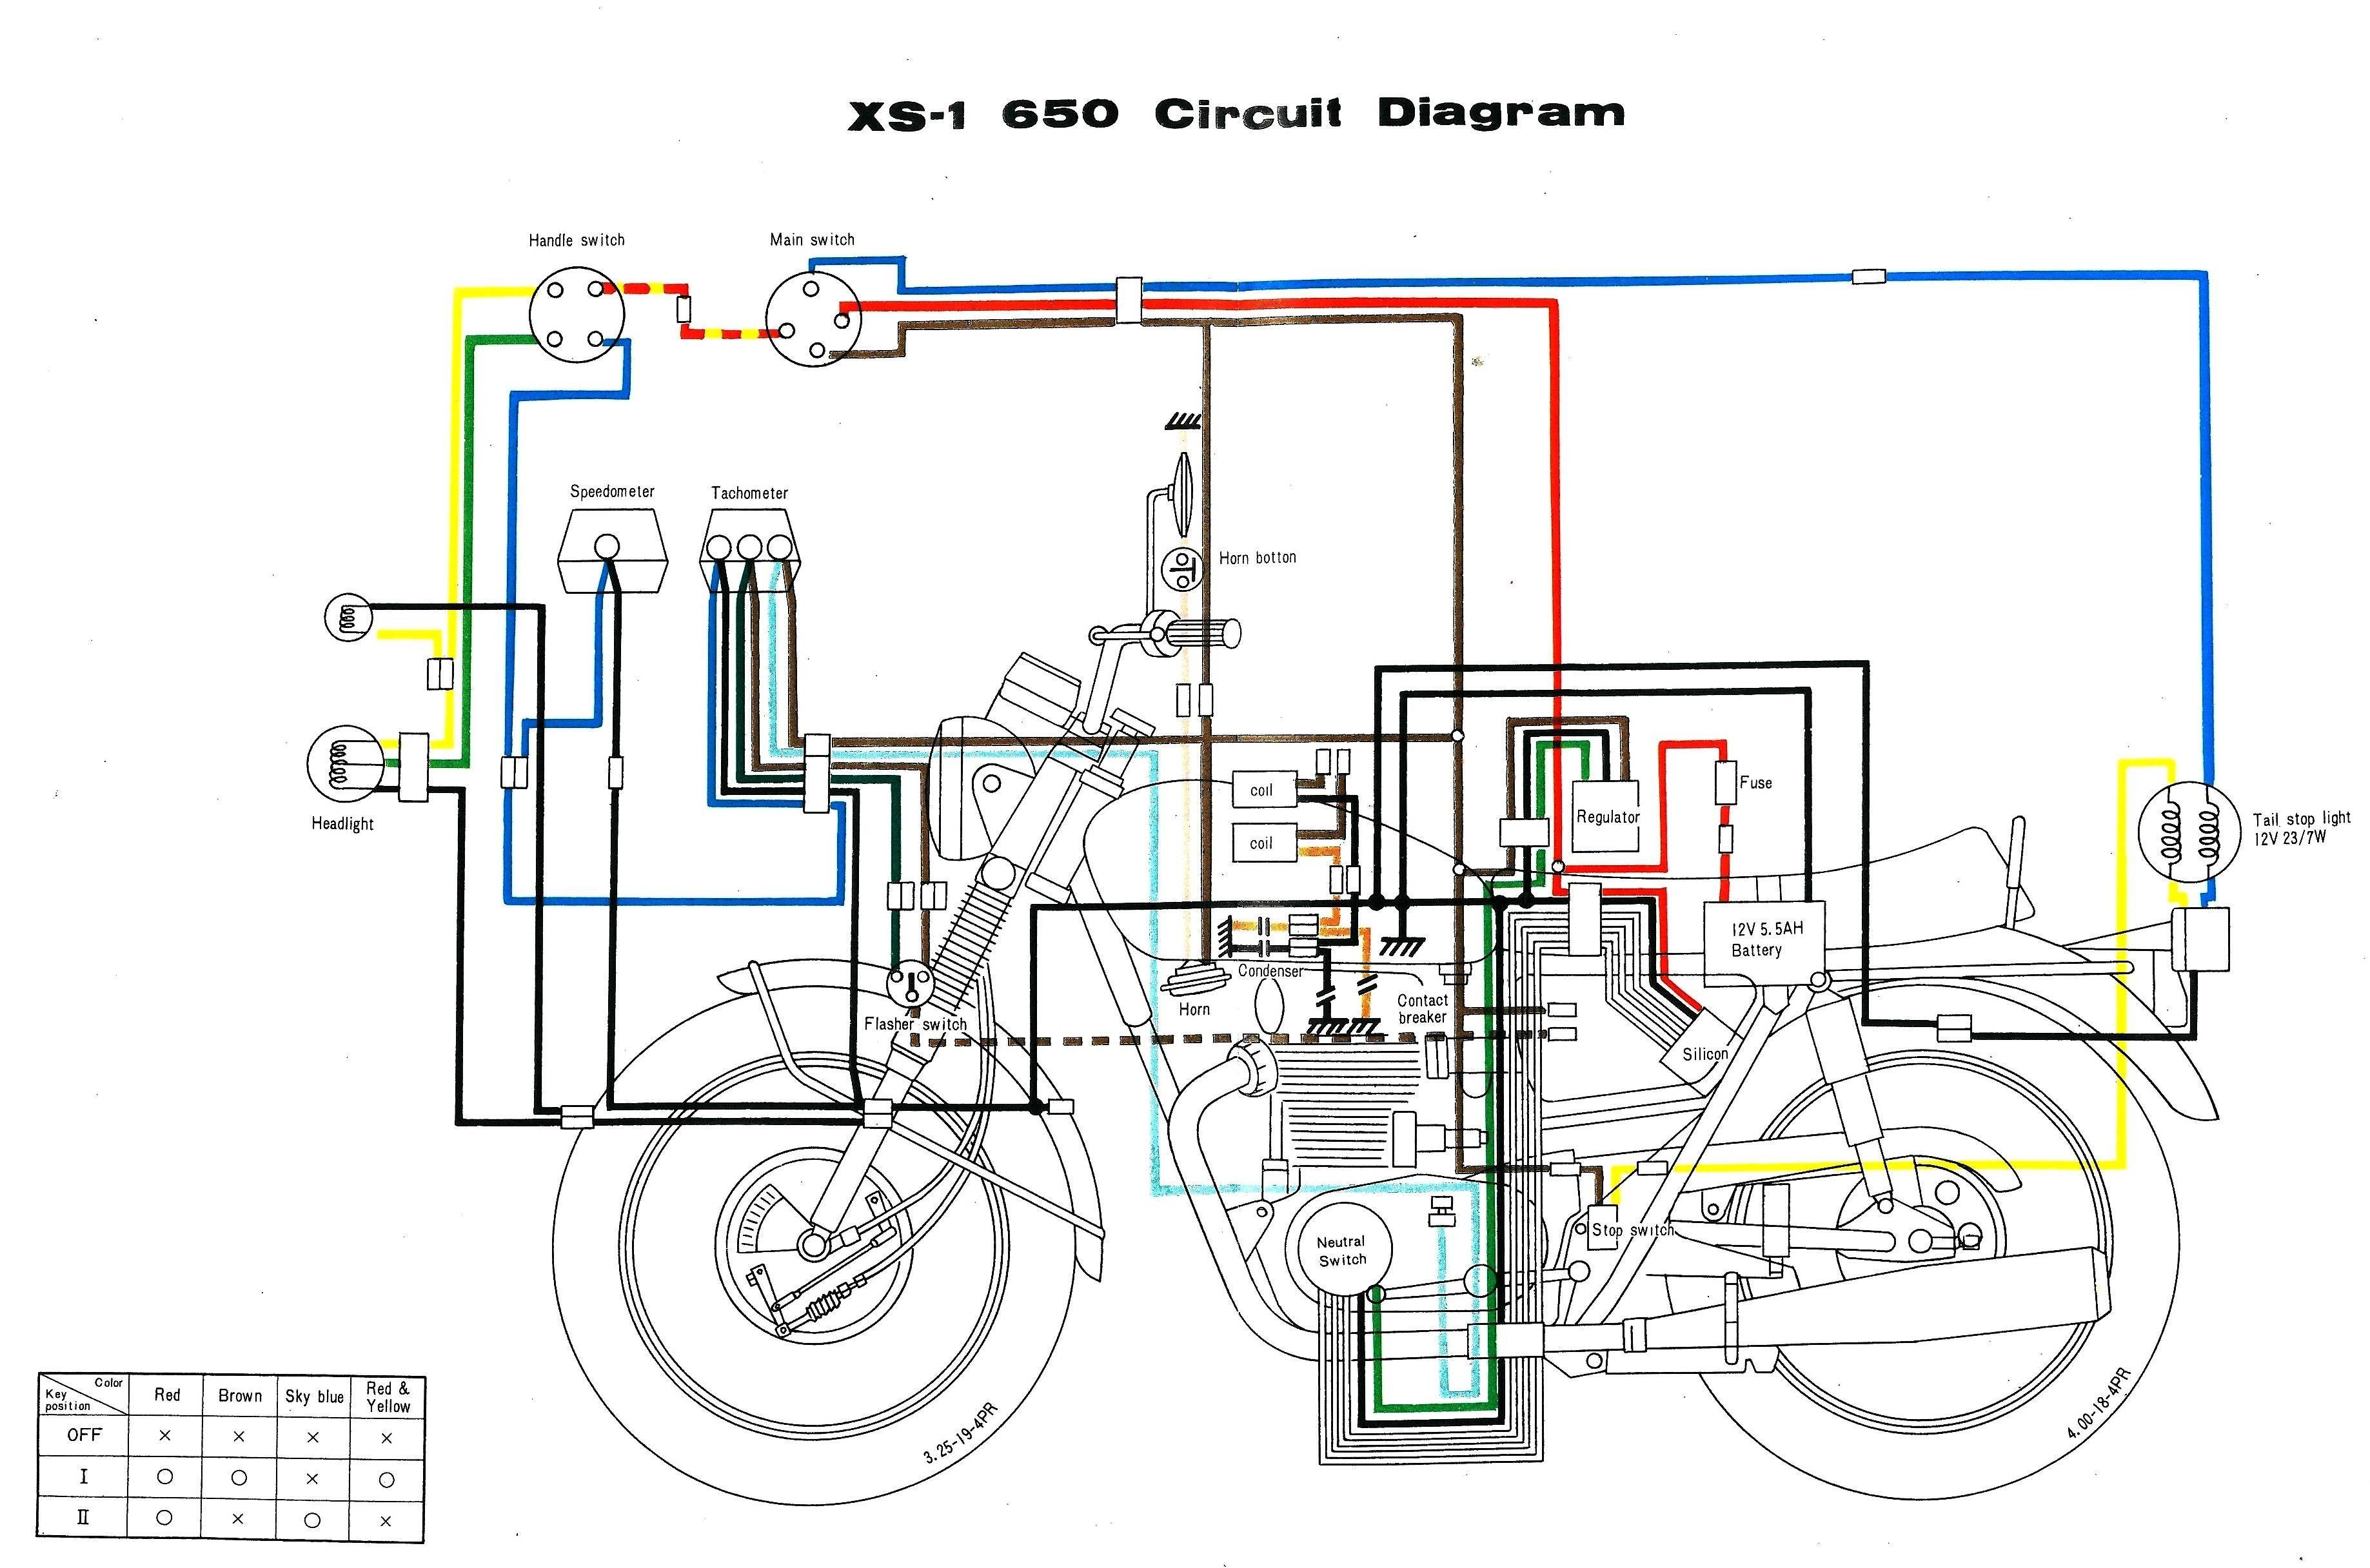 Unique Electrical Circuit Diagram House Wiring Diagram Wiringdiagram Diagramming Di Electrical Circuit Diagram Electrical Wiring Diagram Electrical Diagram